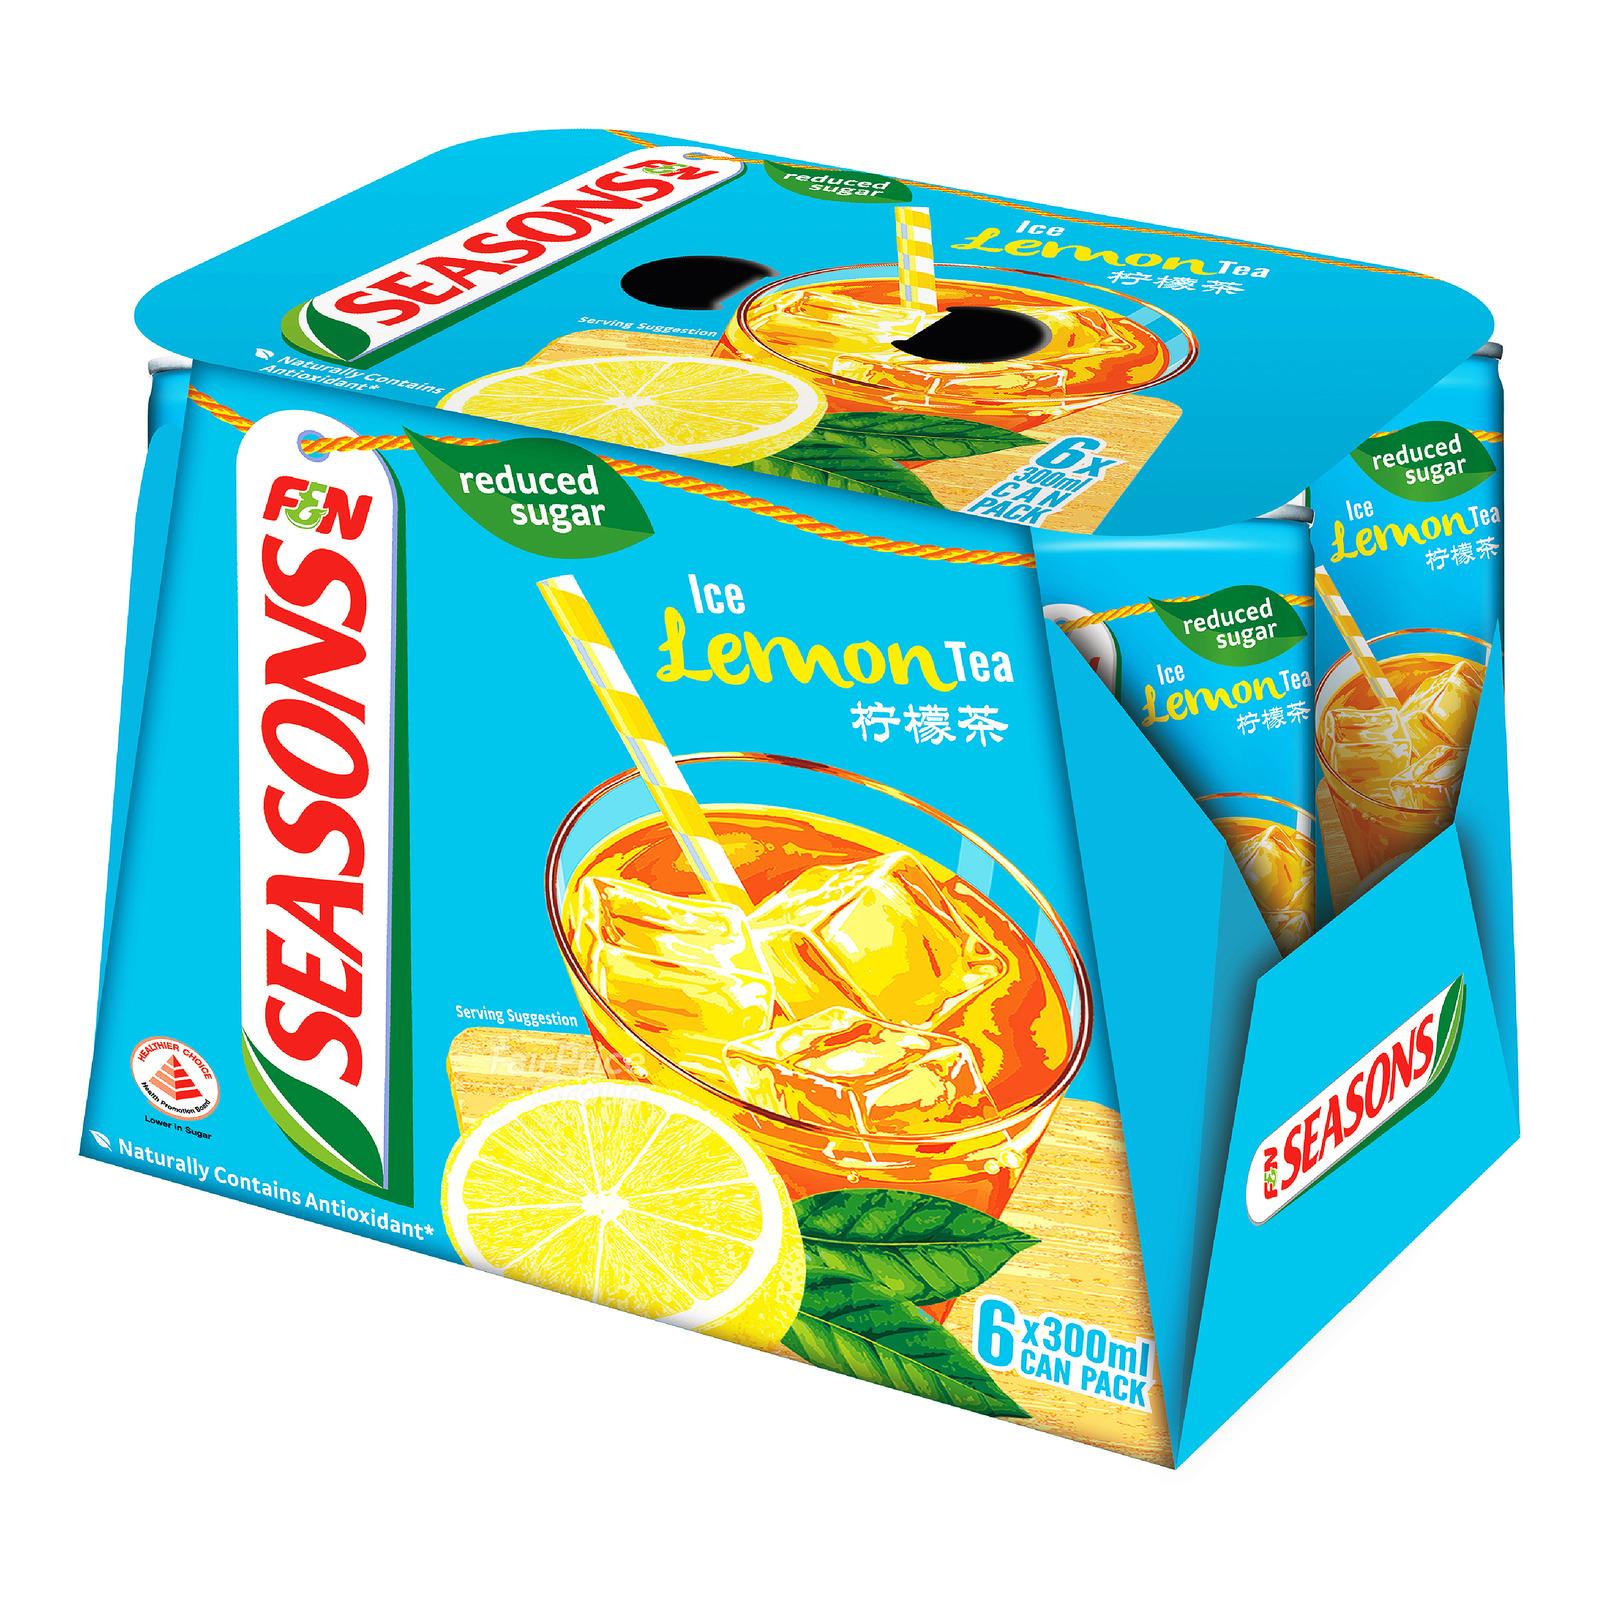 F&N Seasons Can Drink - Ice Lemon Tea (Reduced Sugar)